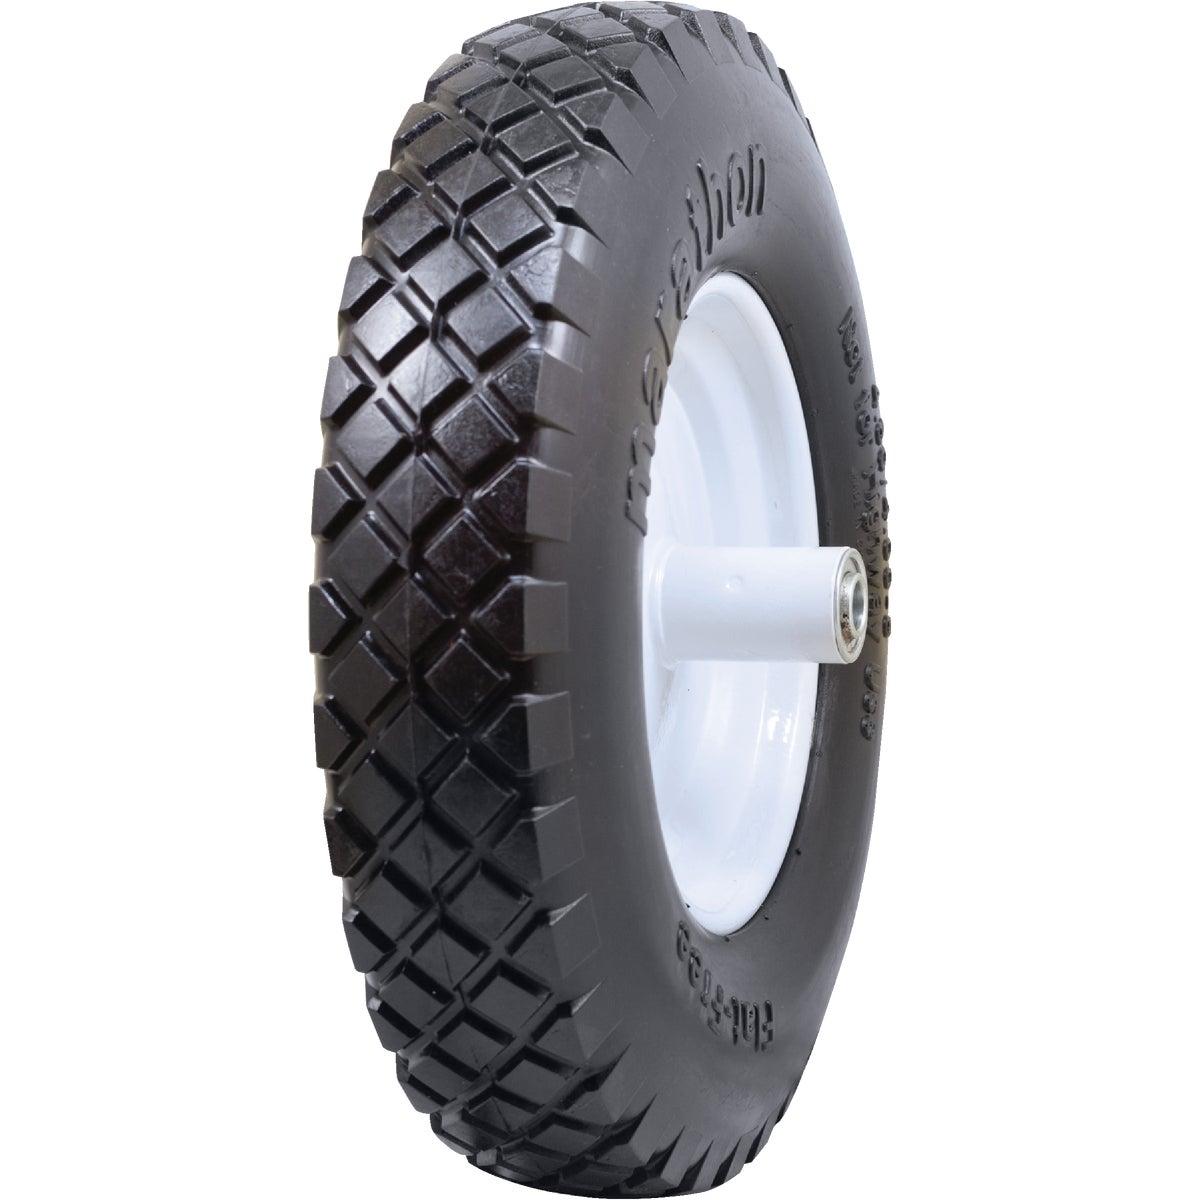 Marathon Flat Free Wheelbarrow Wheel, 47